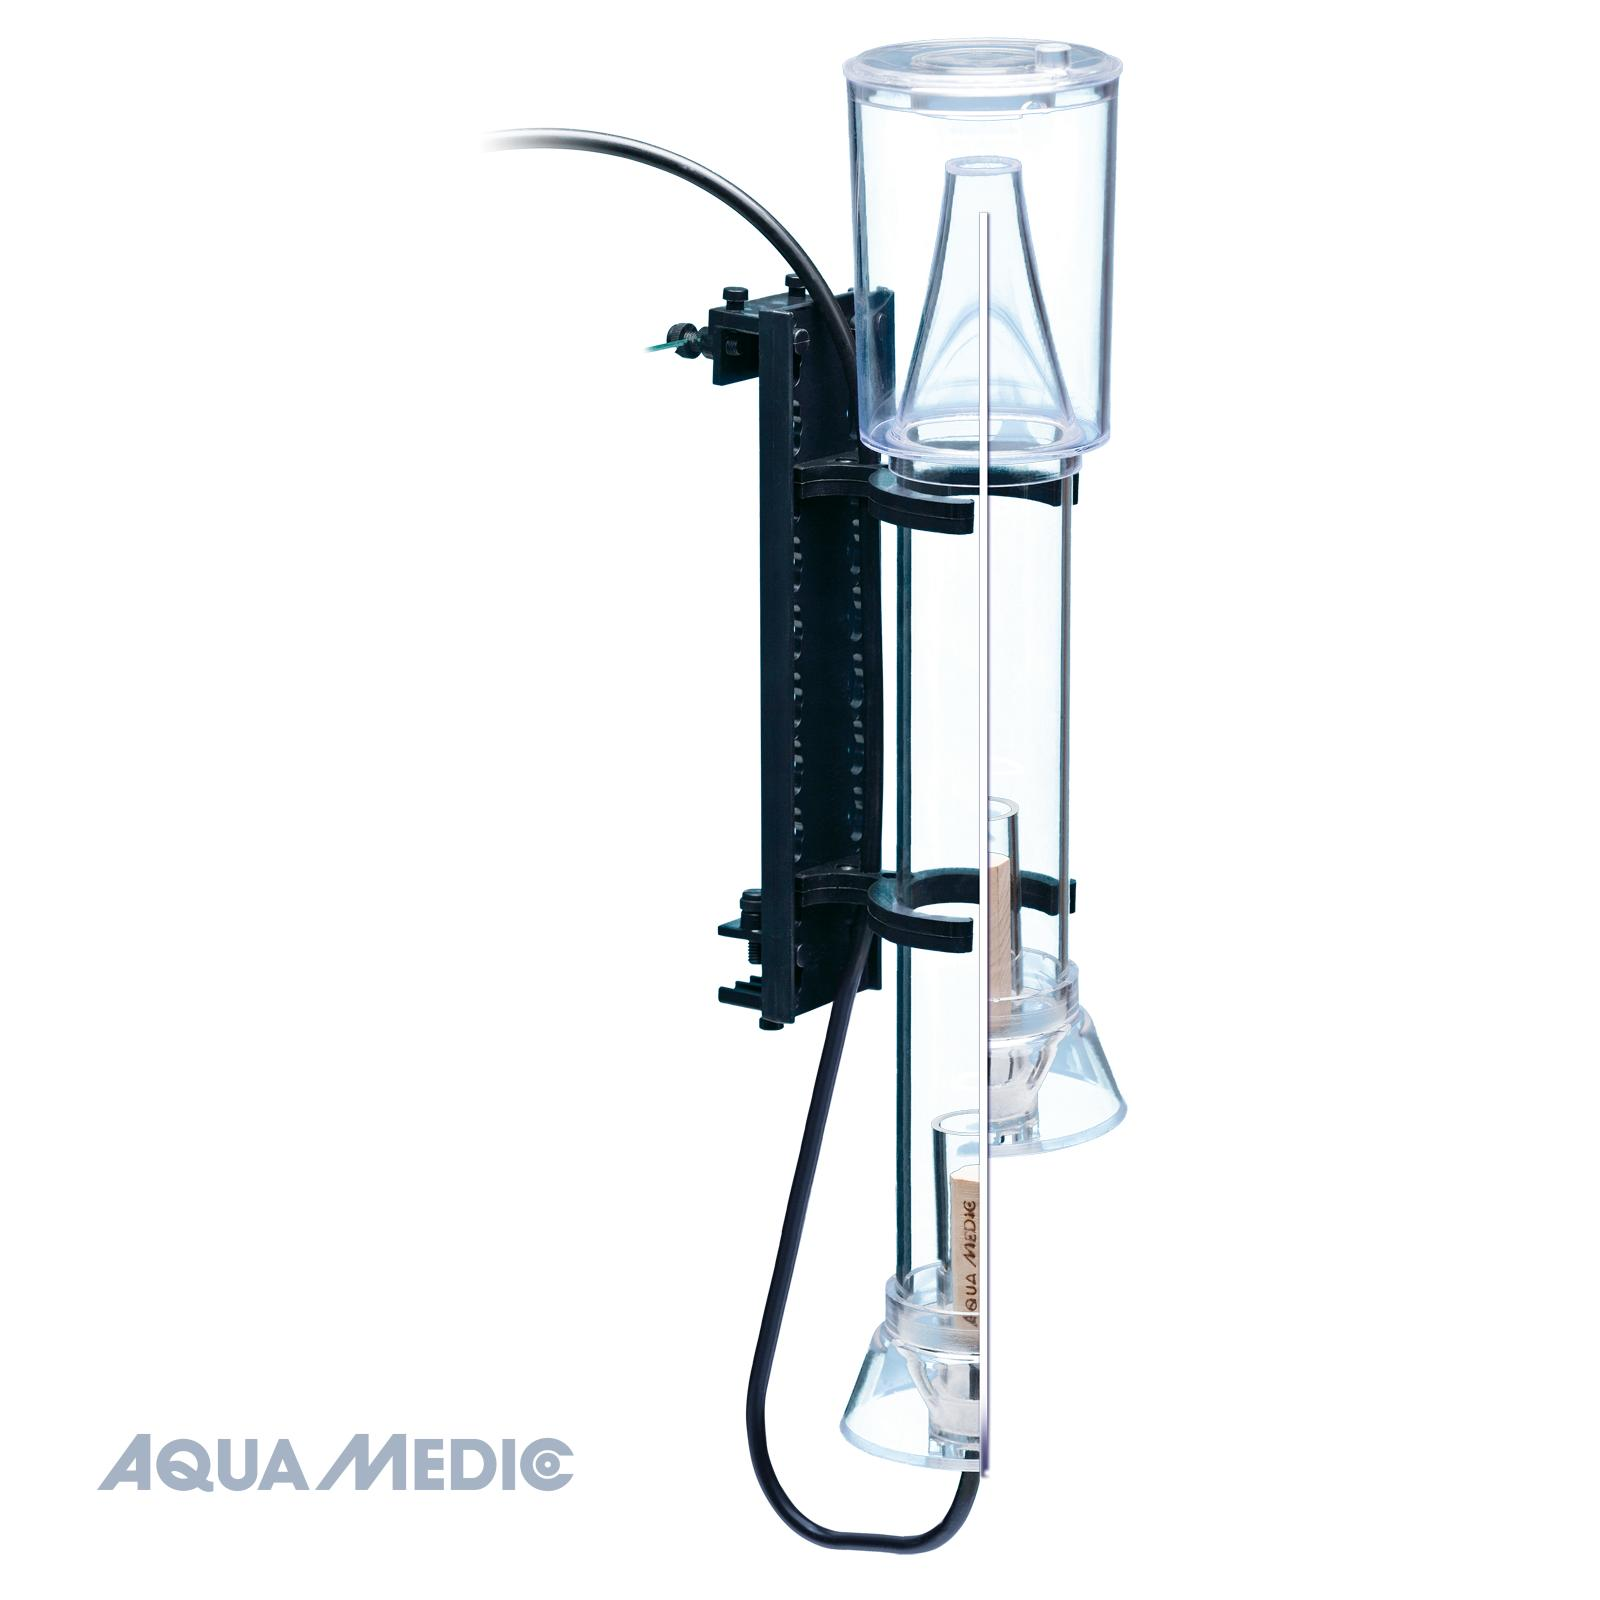 Aquamedic Miniflotor Skimmer